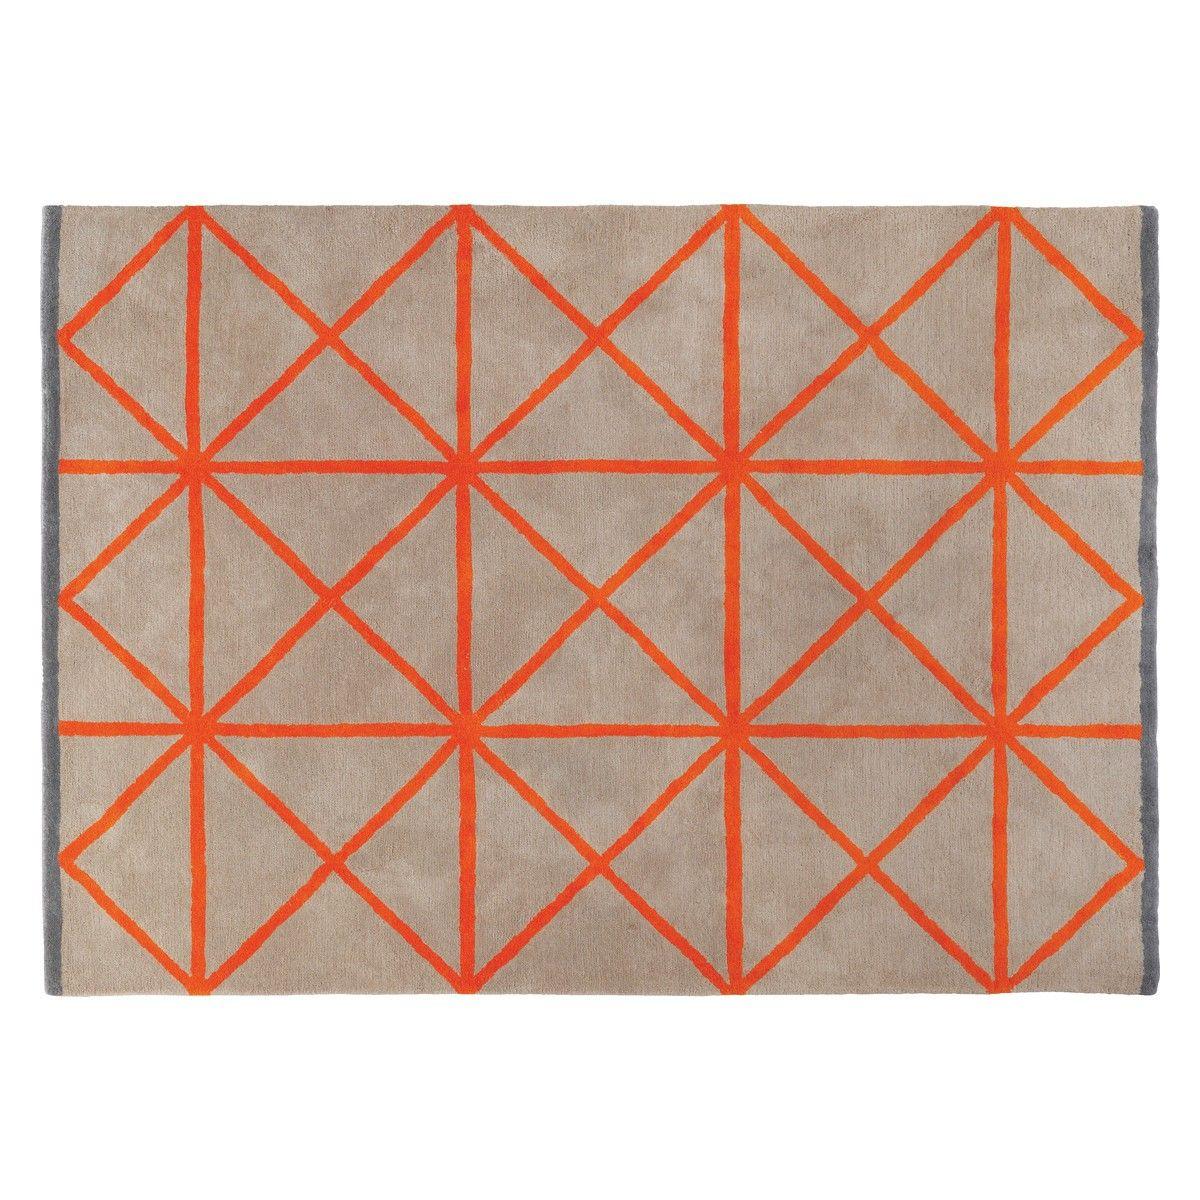 Grid Large Taupe And Orange Rug 170 X